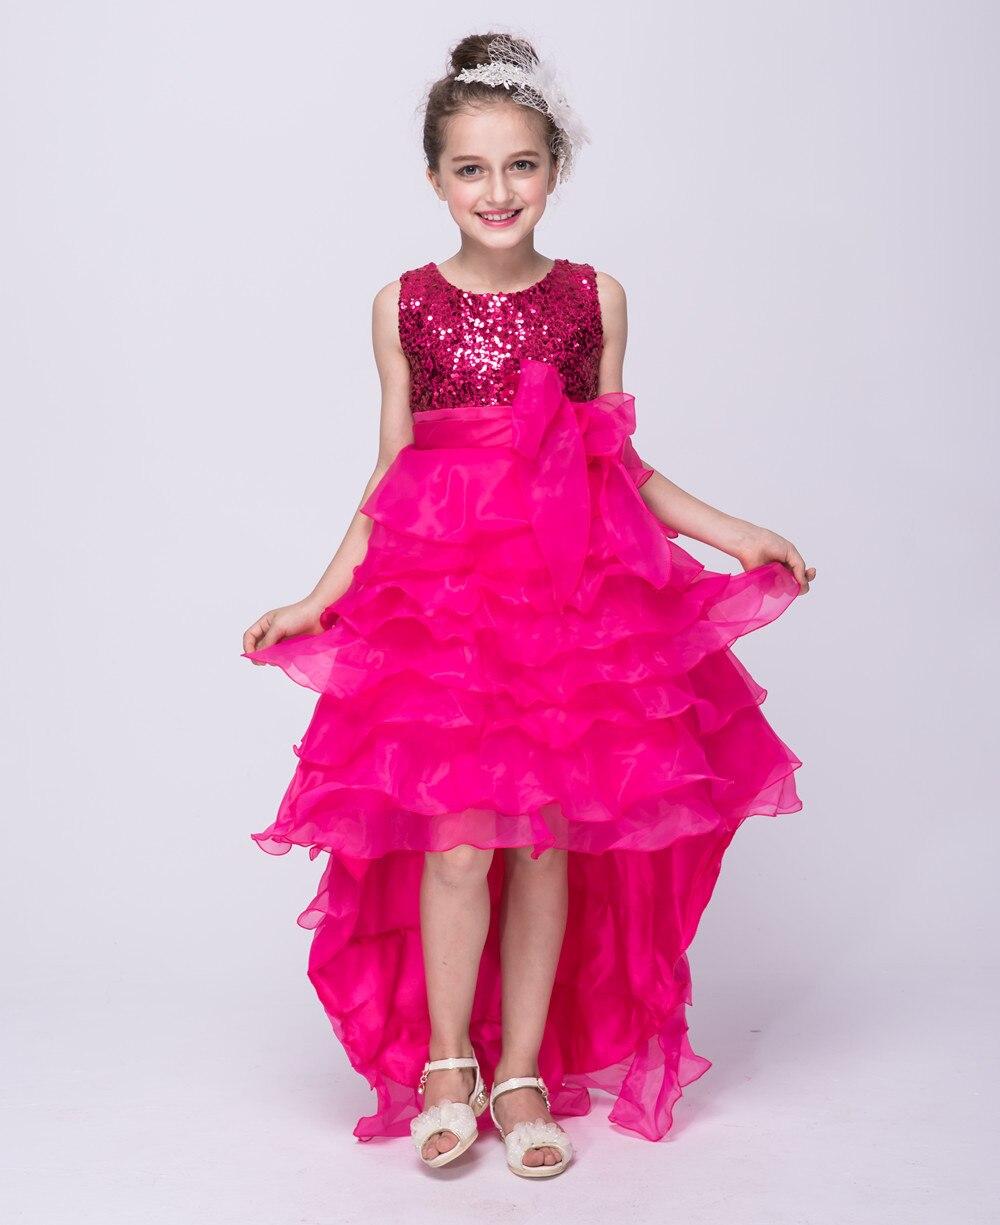 hot-pink-flower-girl-dresses girls dress elegant flower sequin short to long wedding dress with bow party<br><br>Aliexpress